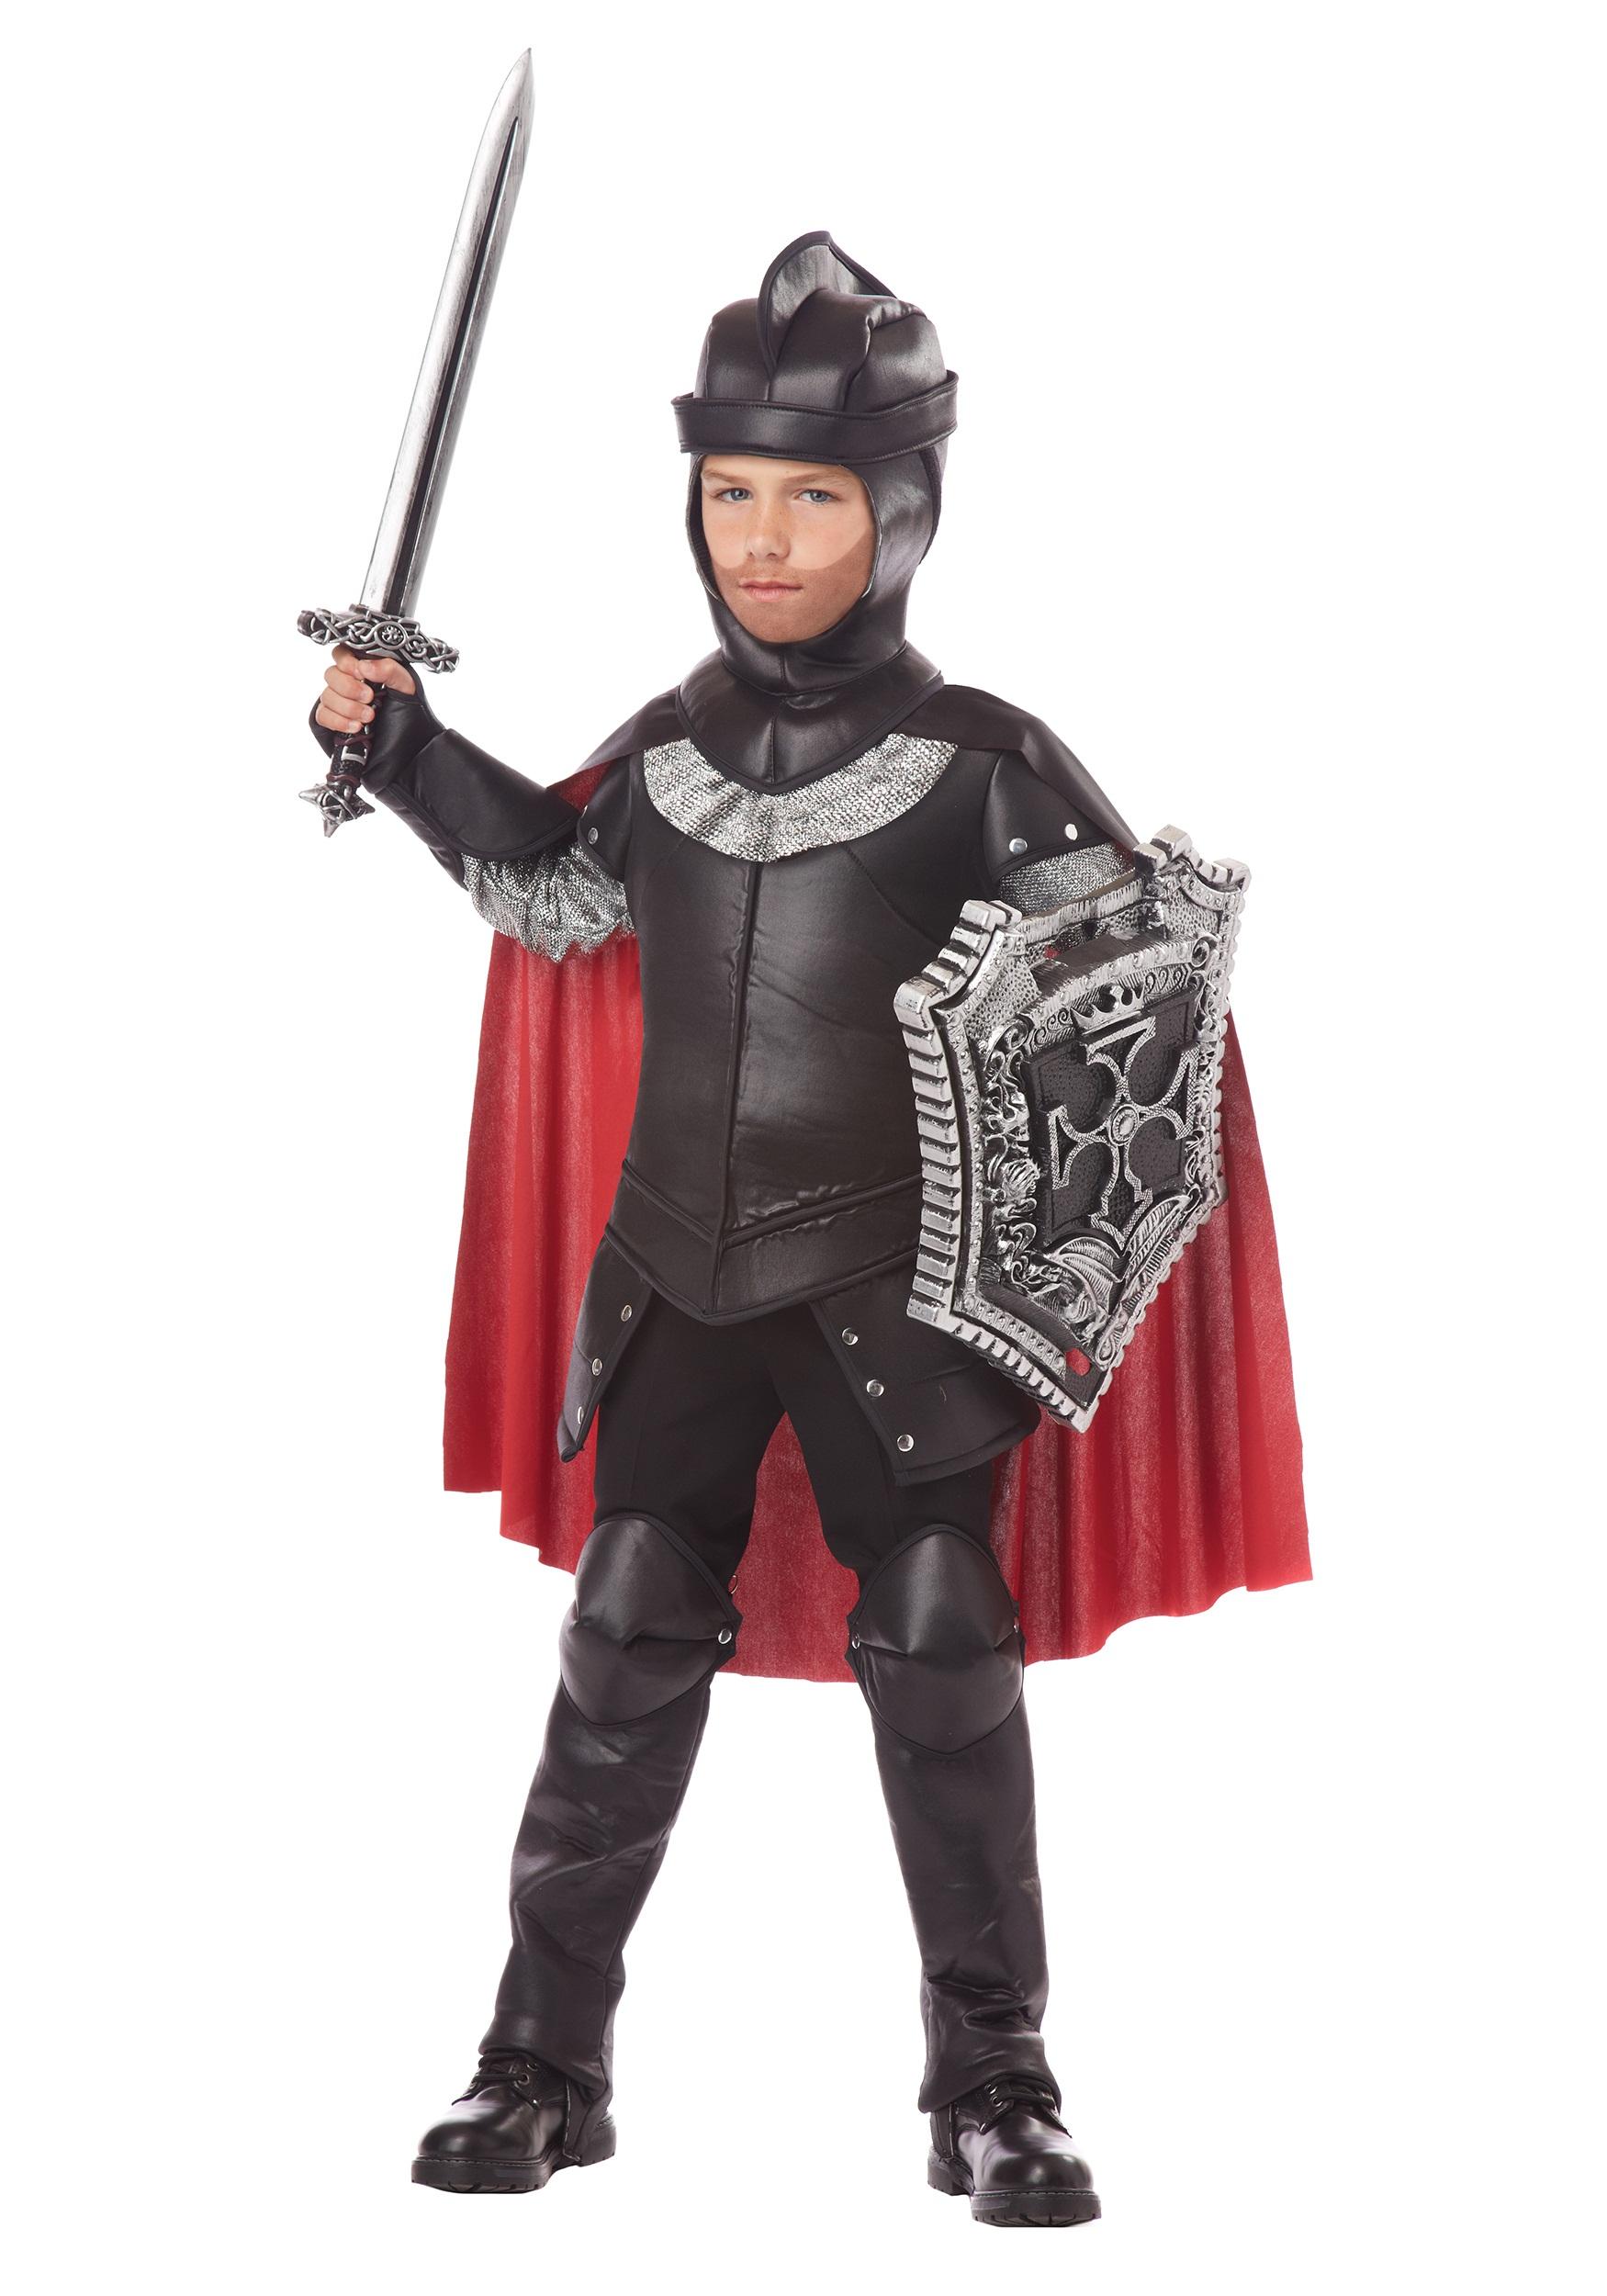 Boys The Black Knight Costume  sc 1 st  Halloween Costumes & Boys The Black Knight Costume - Halloween Costumes